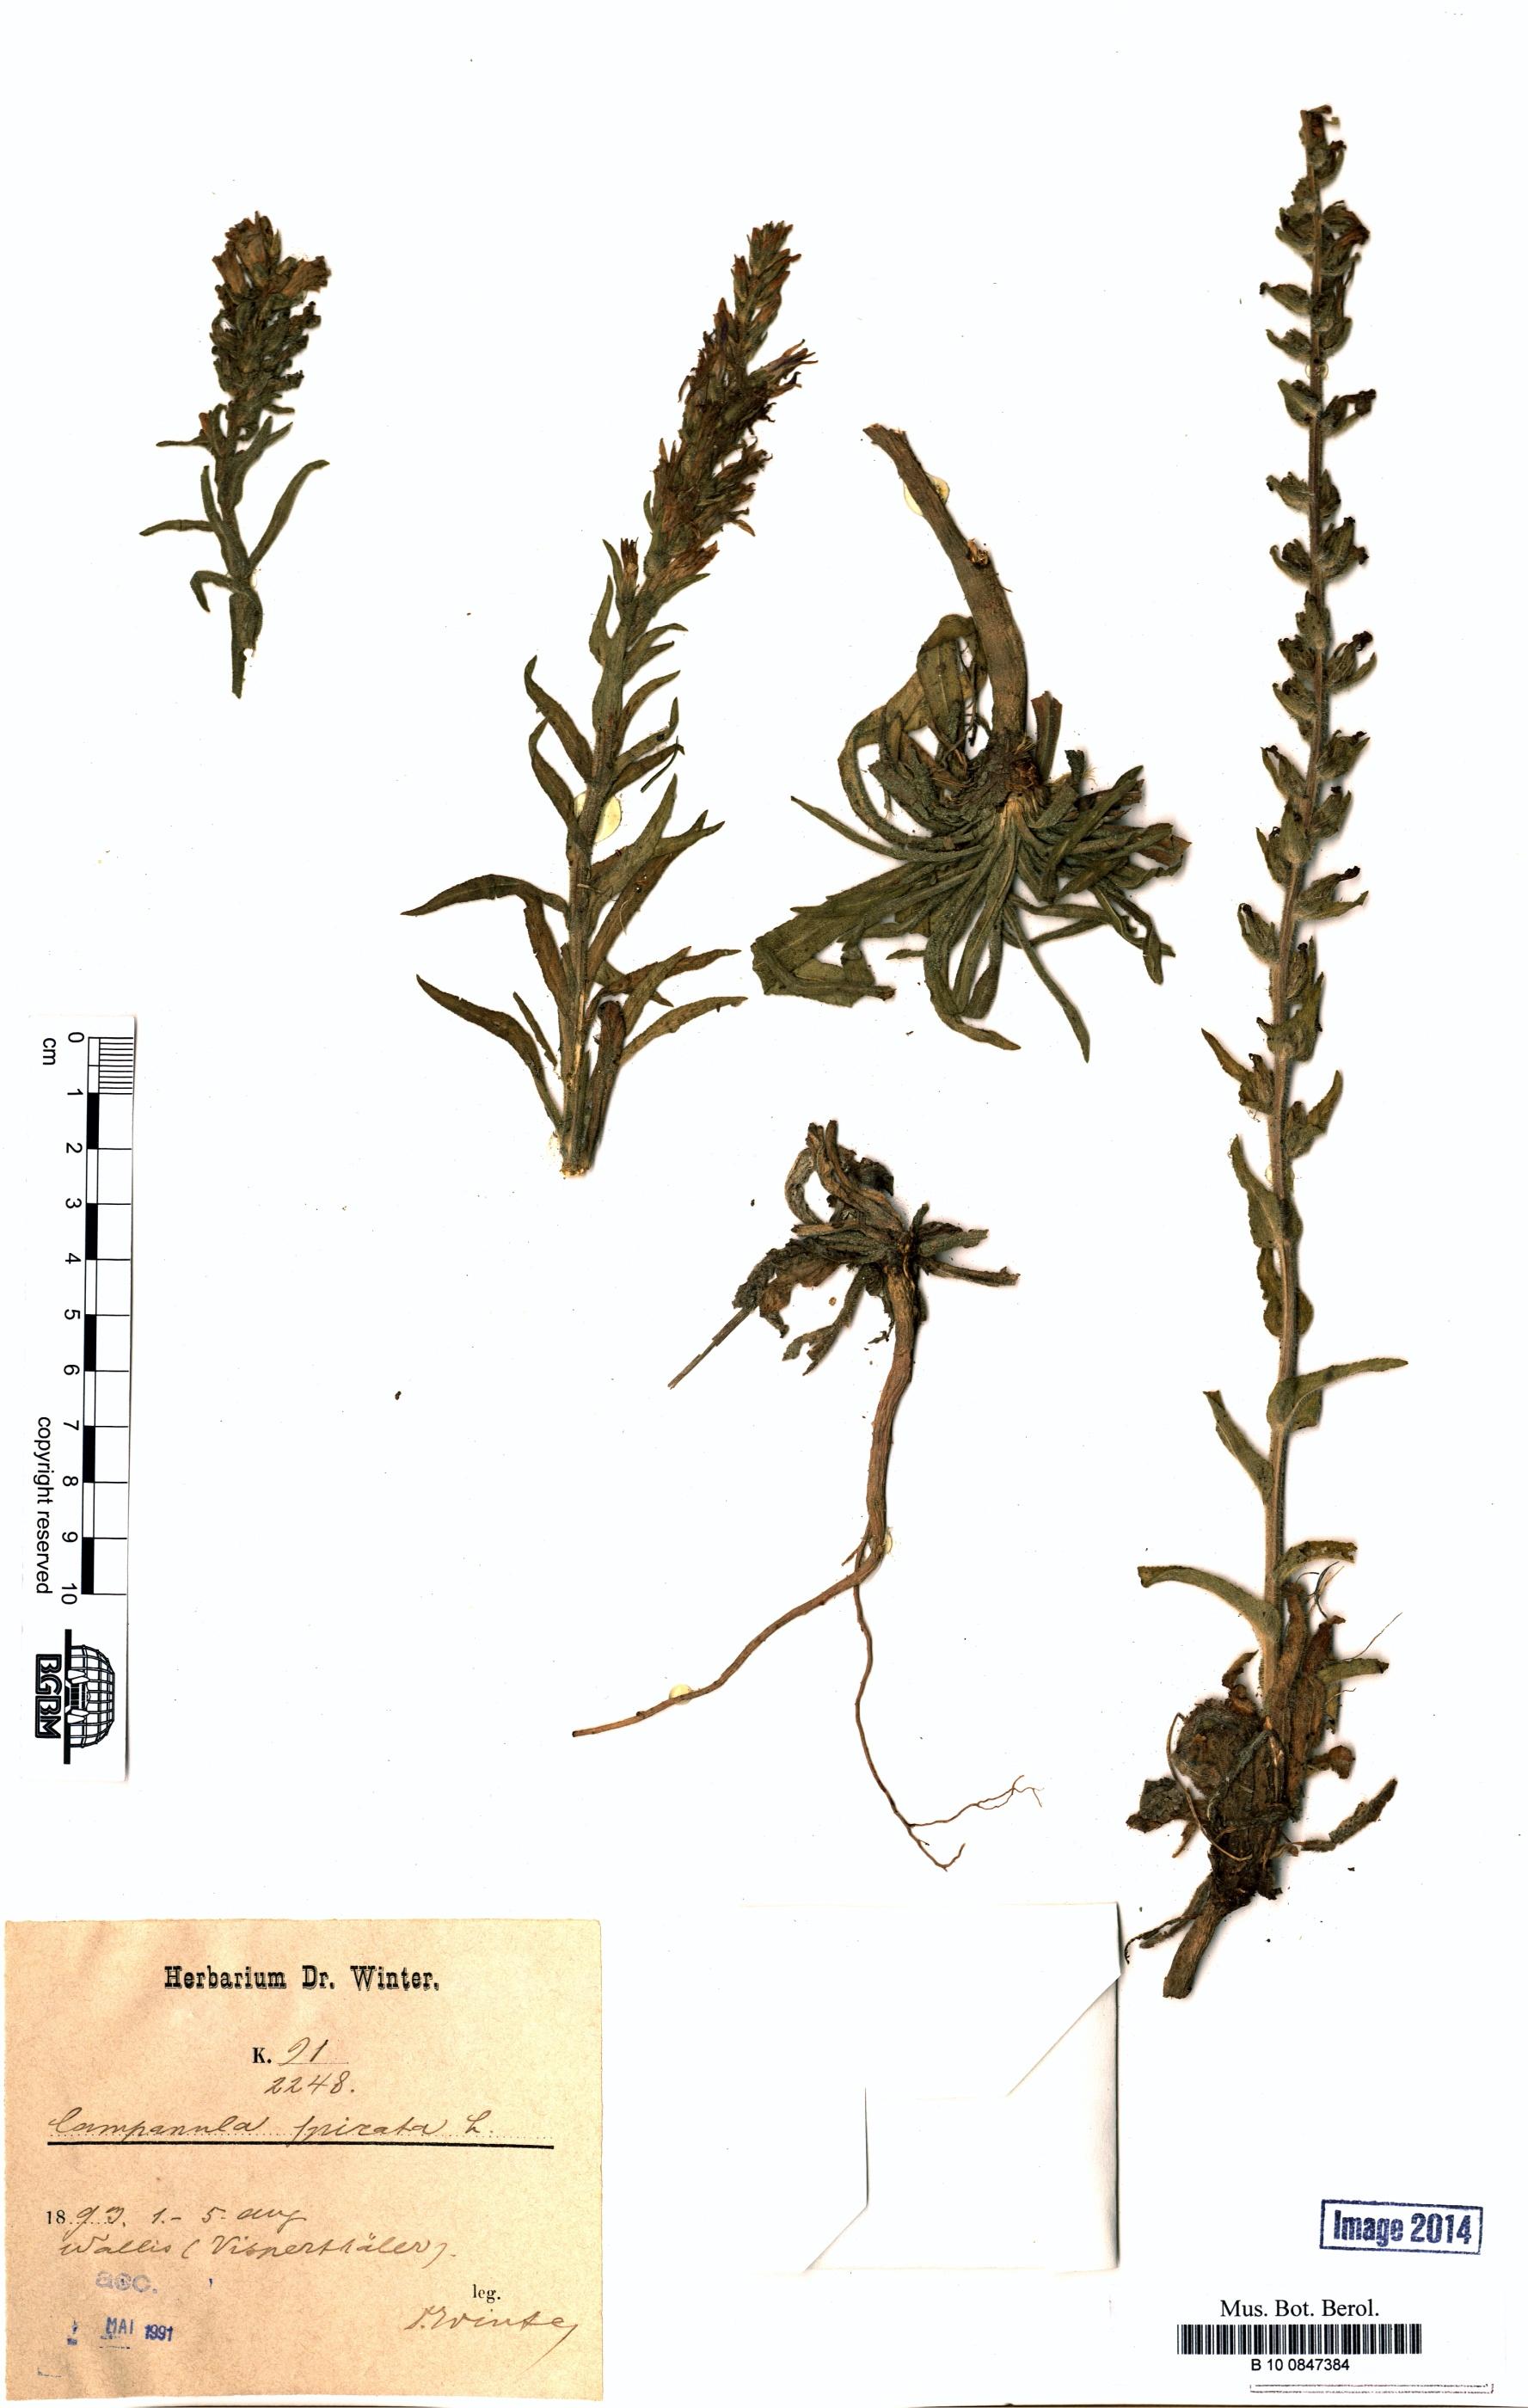 http://ww2.bgbm.org/herbarium/images/B/10/08/47/38/B_10_0847384.jpg